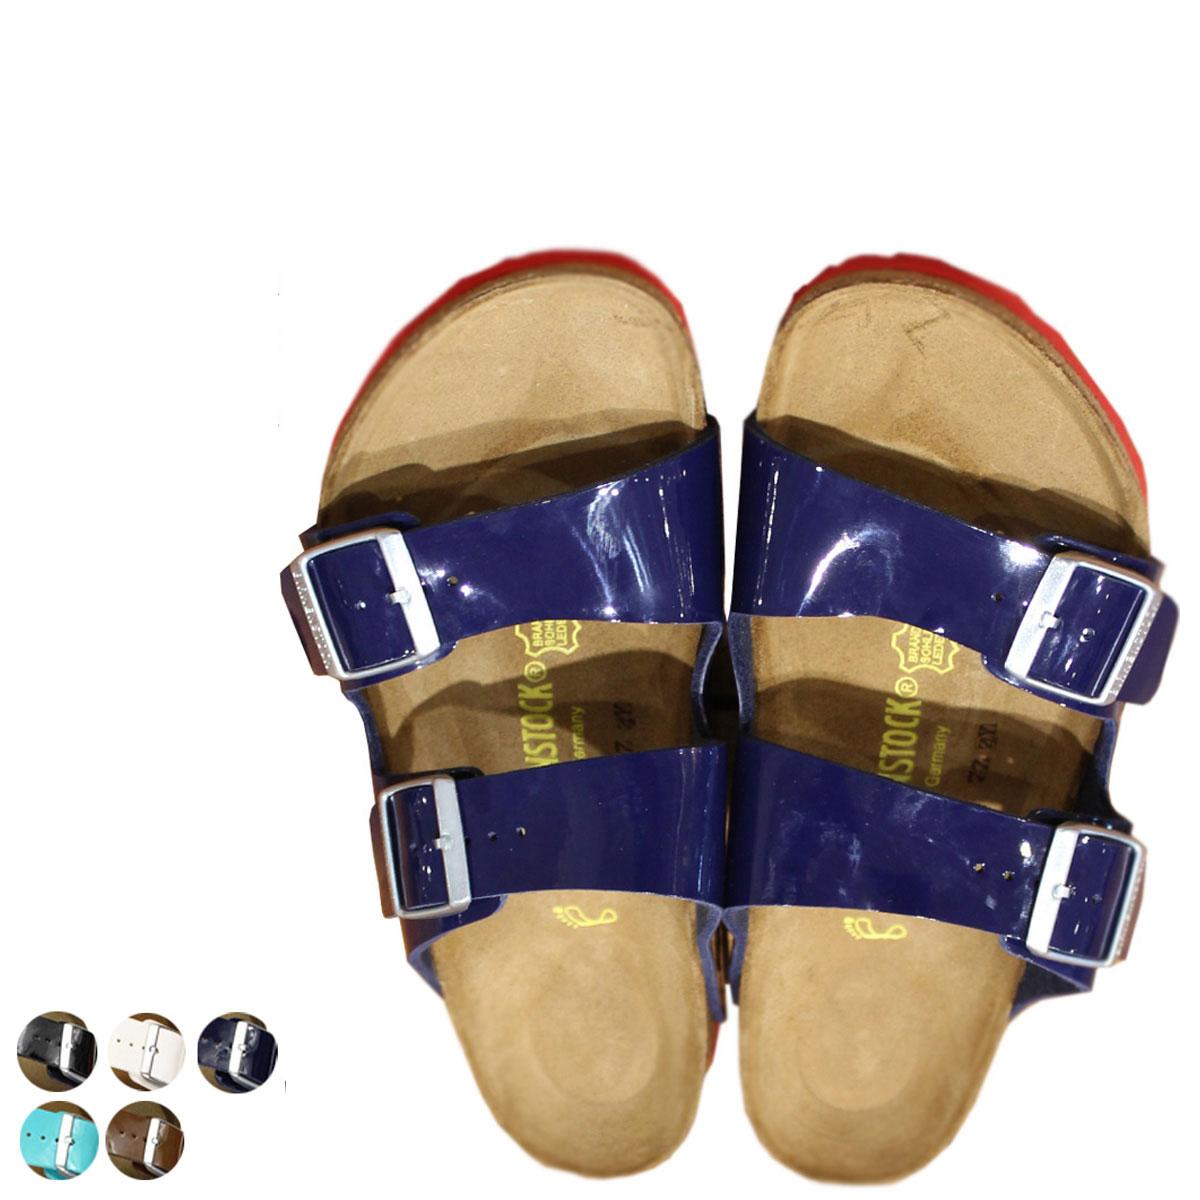 44af6f1ec272 Whats up Sports  BIRKENSTOCK-Birkenstock Arizona vilken Sandals usually  wide ARIZONA mens